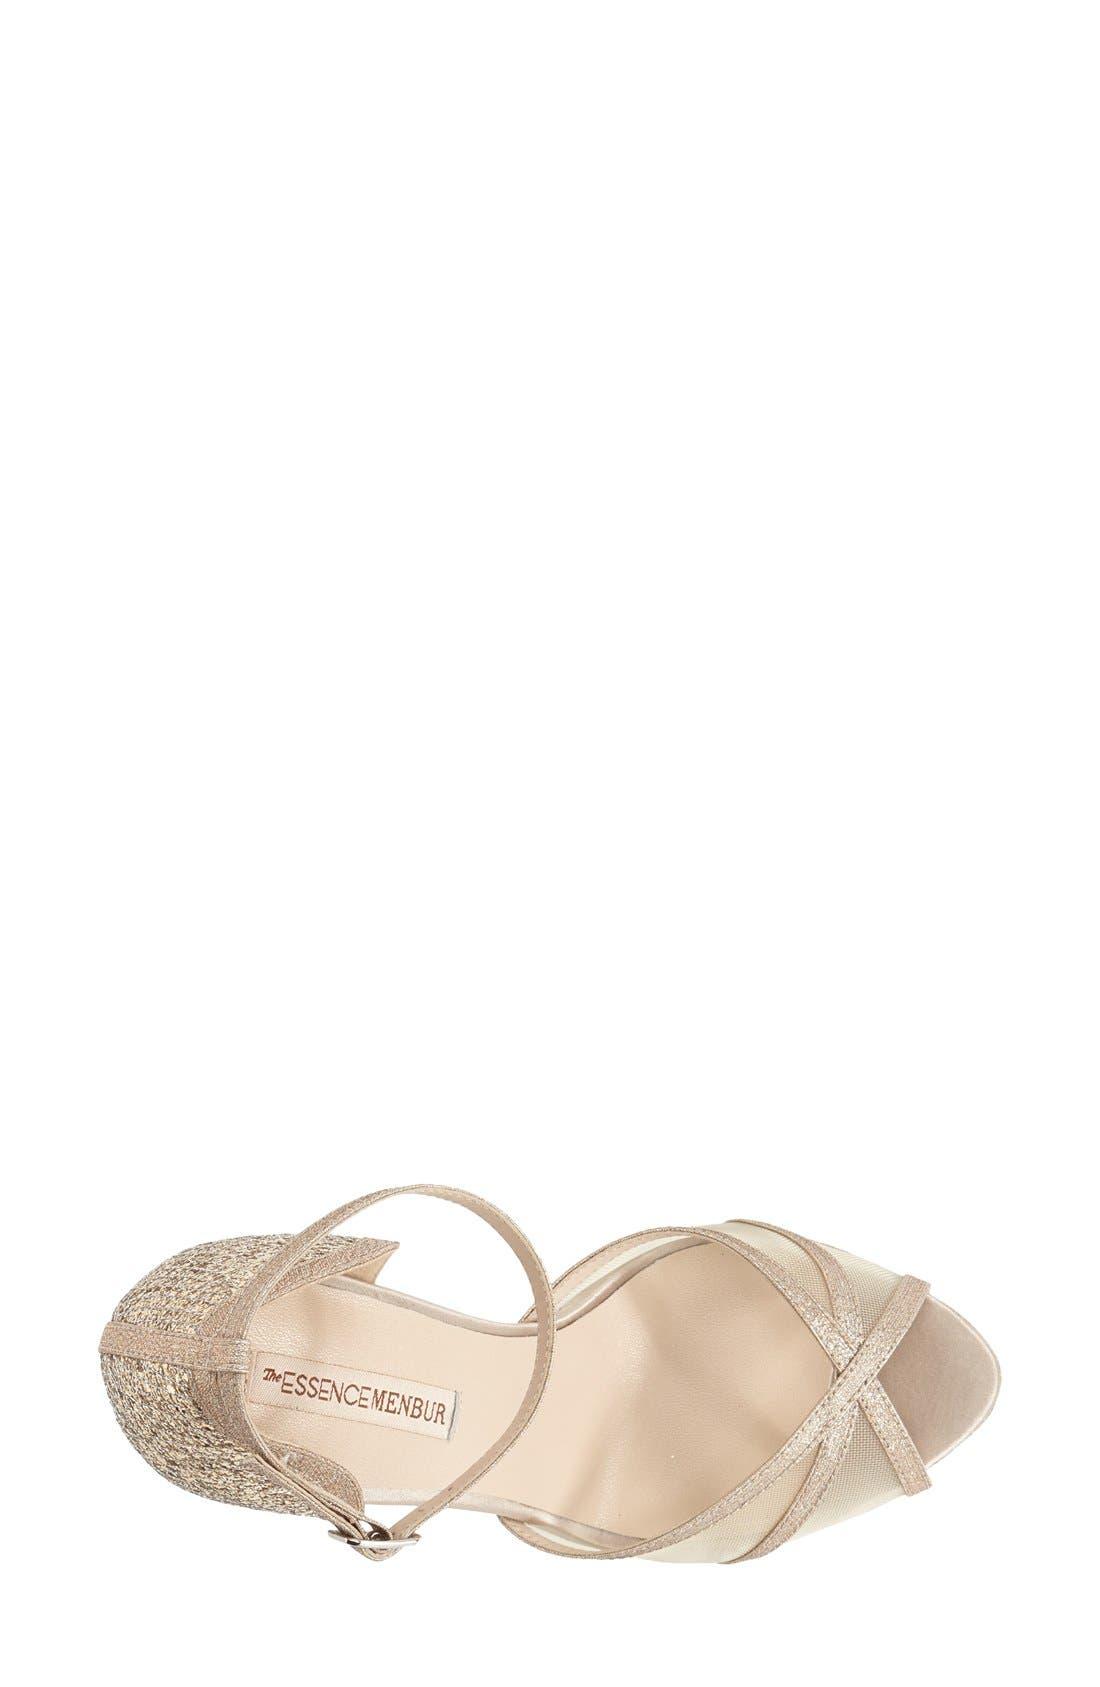 Alternate Image 3  - Menbur 'Anora' Ankle Strap Platform Sandal (Women)